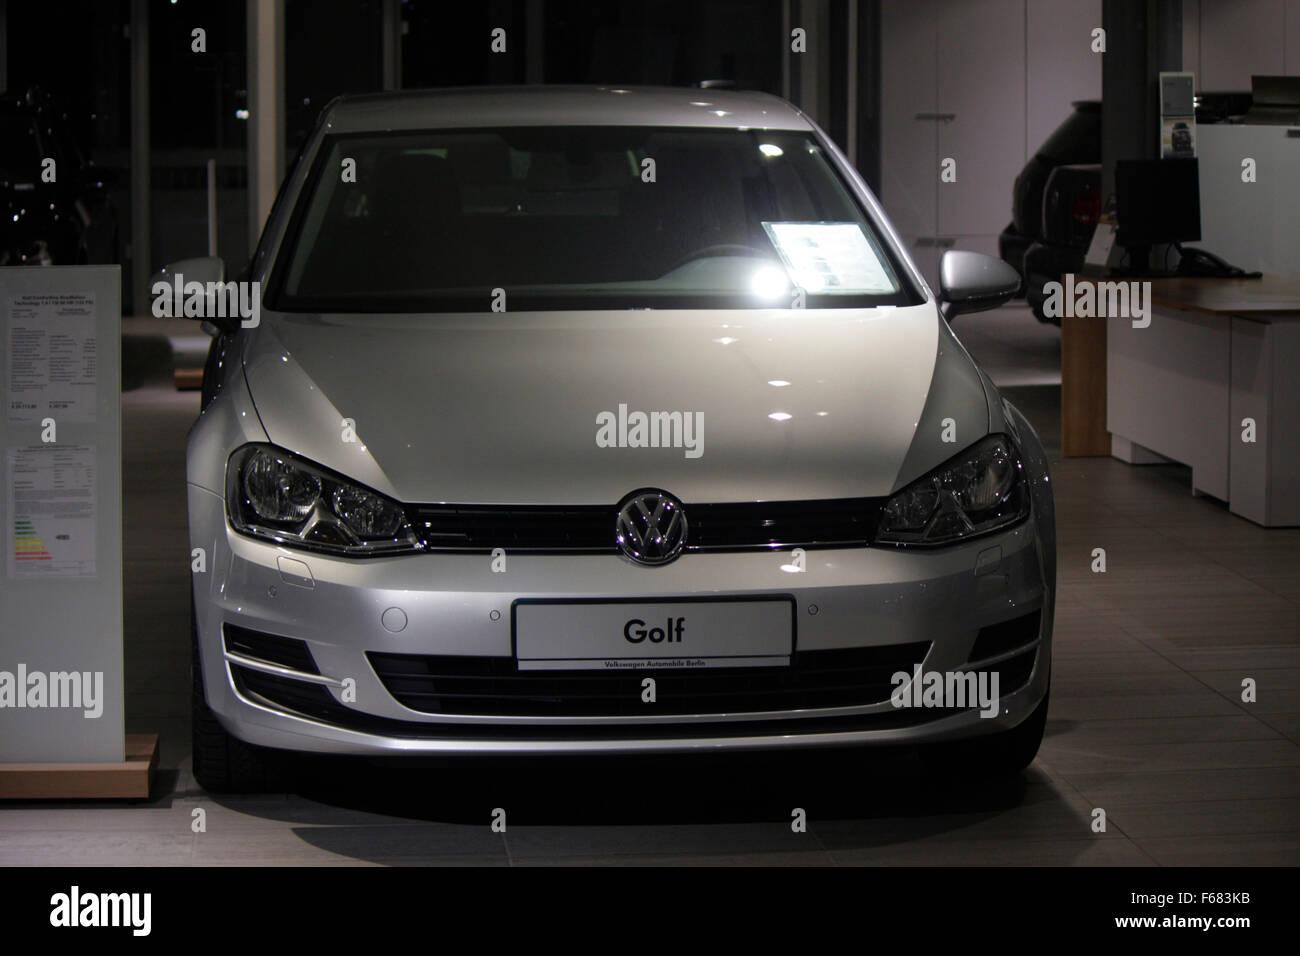 Markenname: 'VW Golf Volkswagen', Berlin. - Stock Image